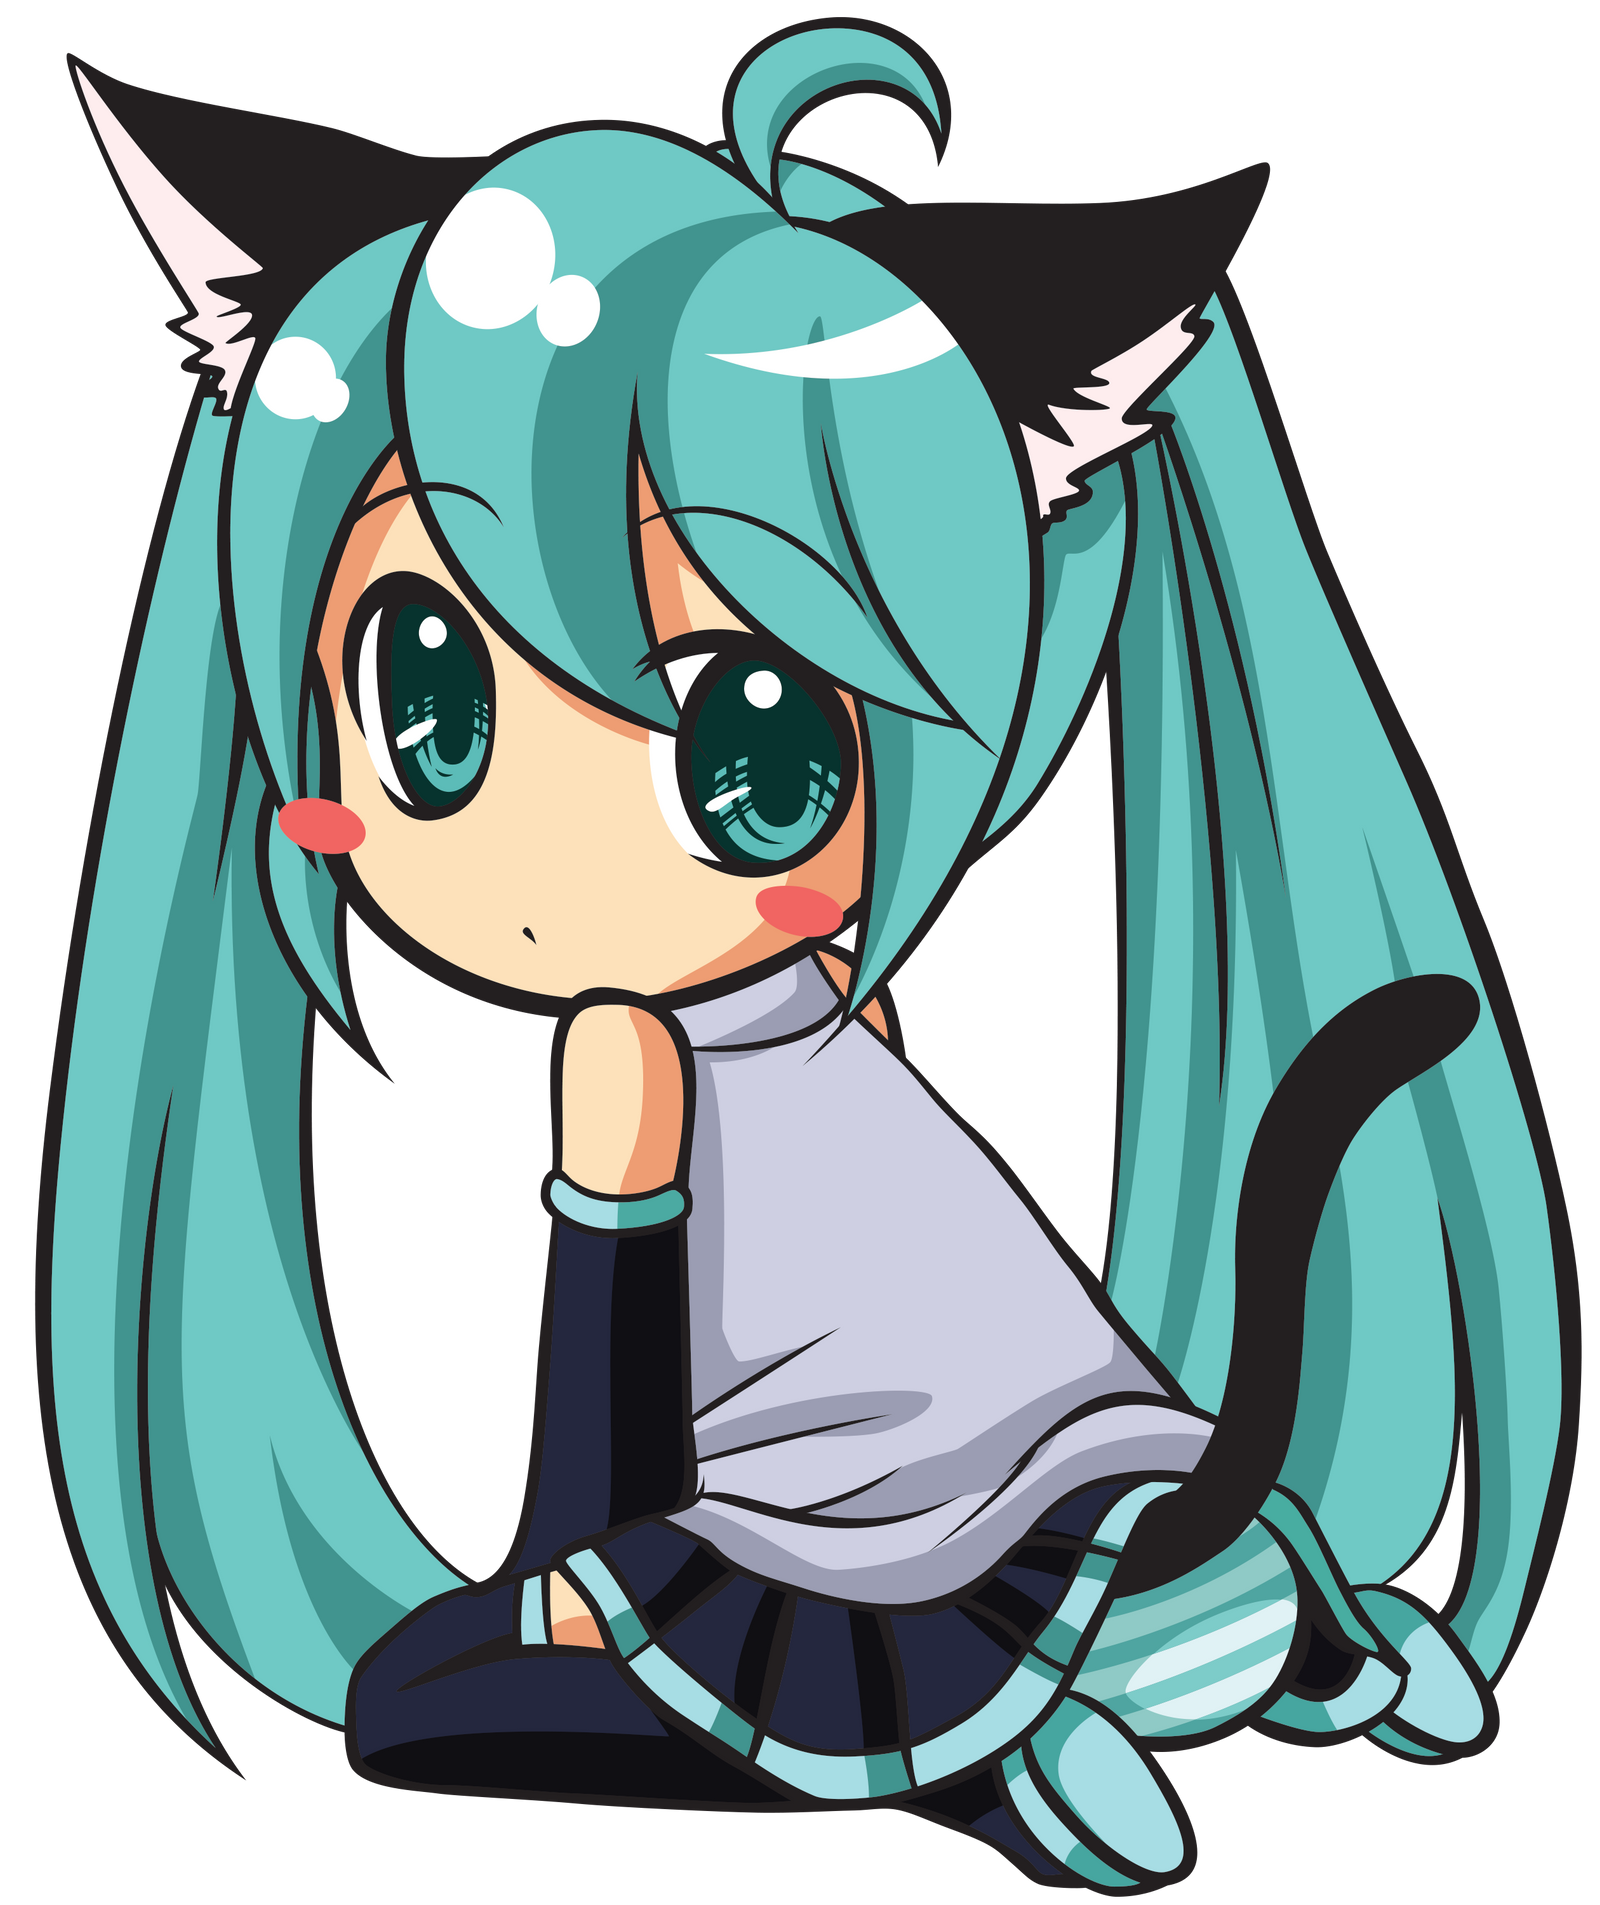 Vocaloid Chibi Miku Hatsune Miku Chibi Vec...